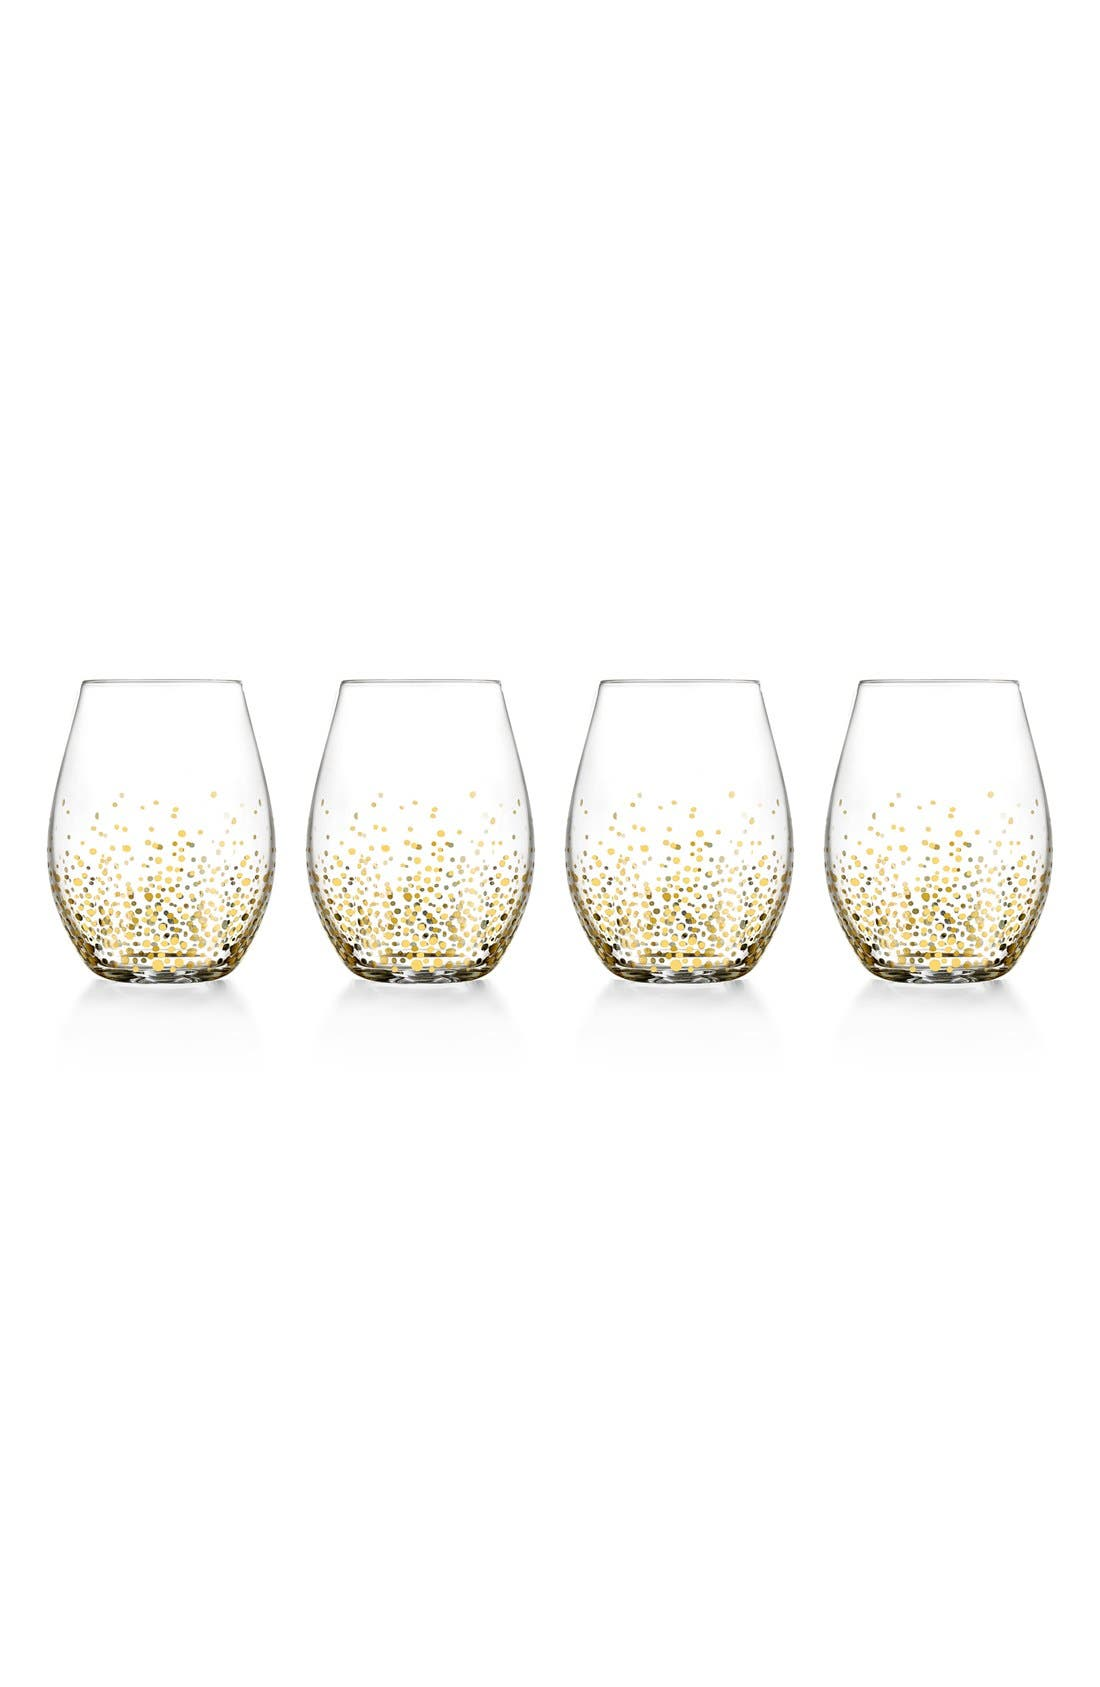 Main Image - American Atelier Daphne Set of 4 Stemless Wine Glasses